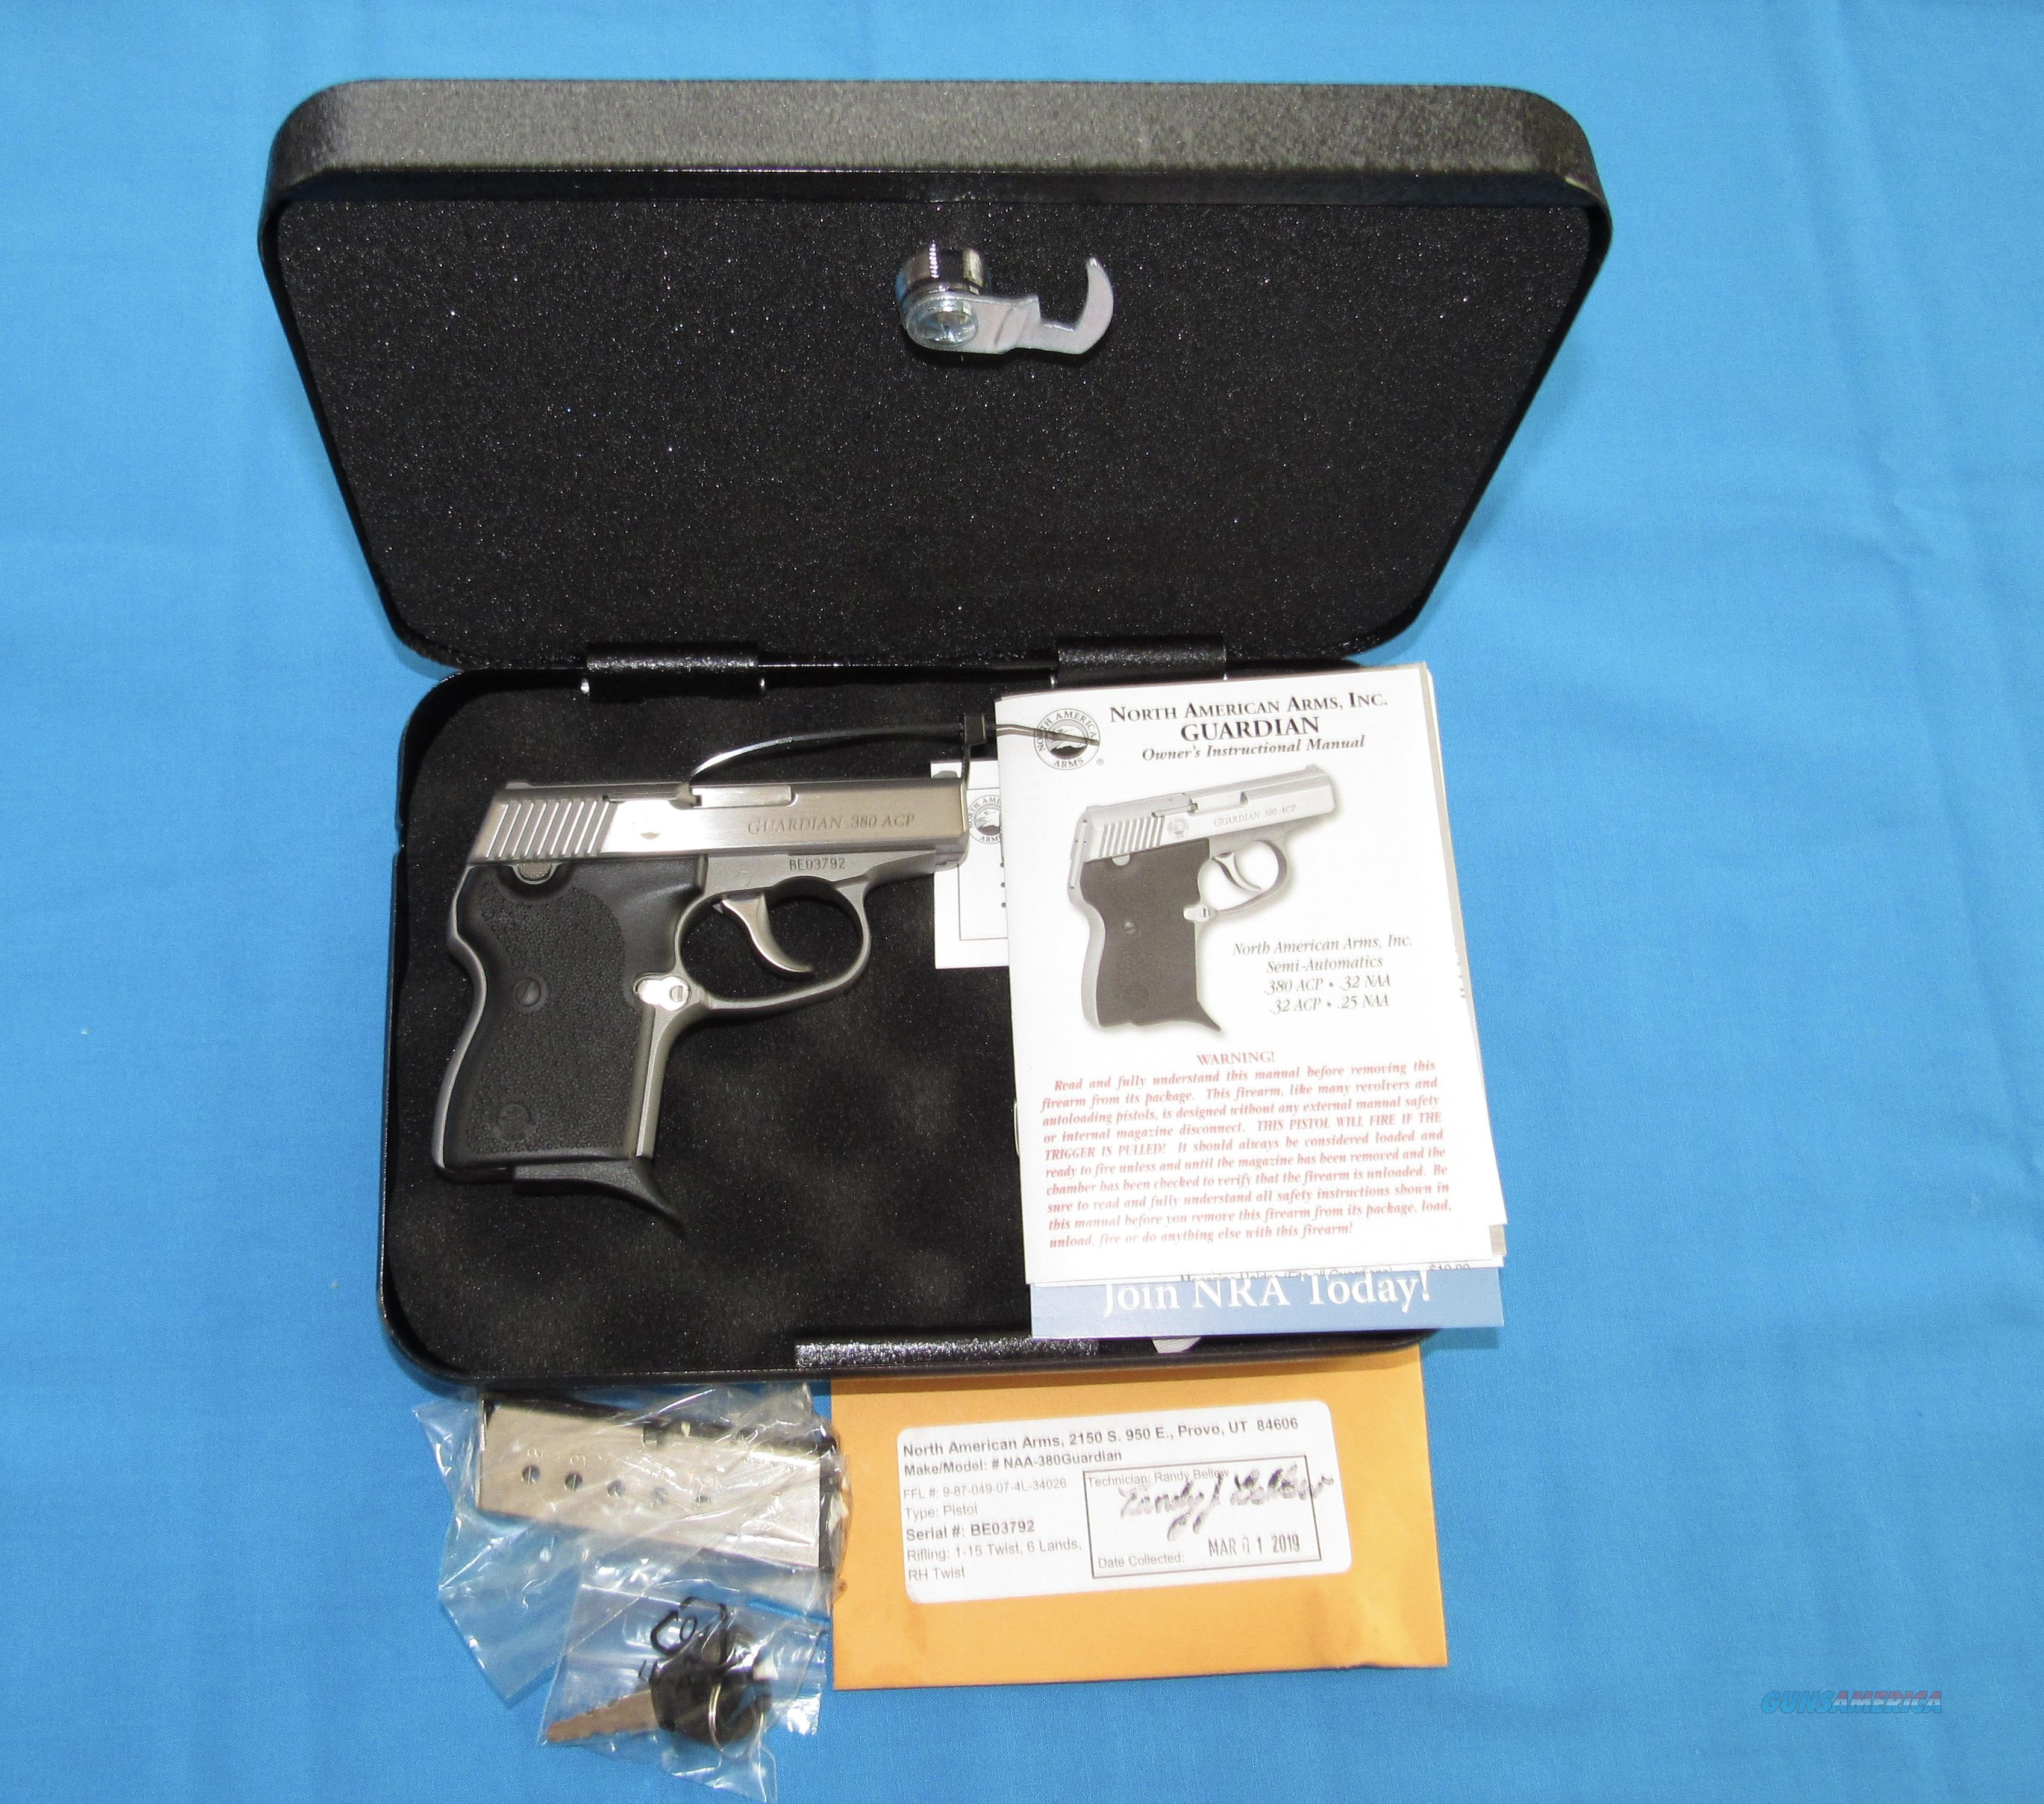 NORTH AMERICAN ARMS GUARDIAN 380ACP PISTOL  Guns > Pistols > North American Arms Pistols